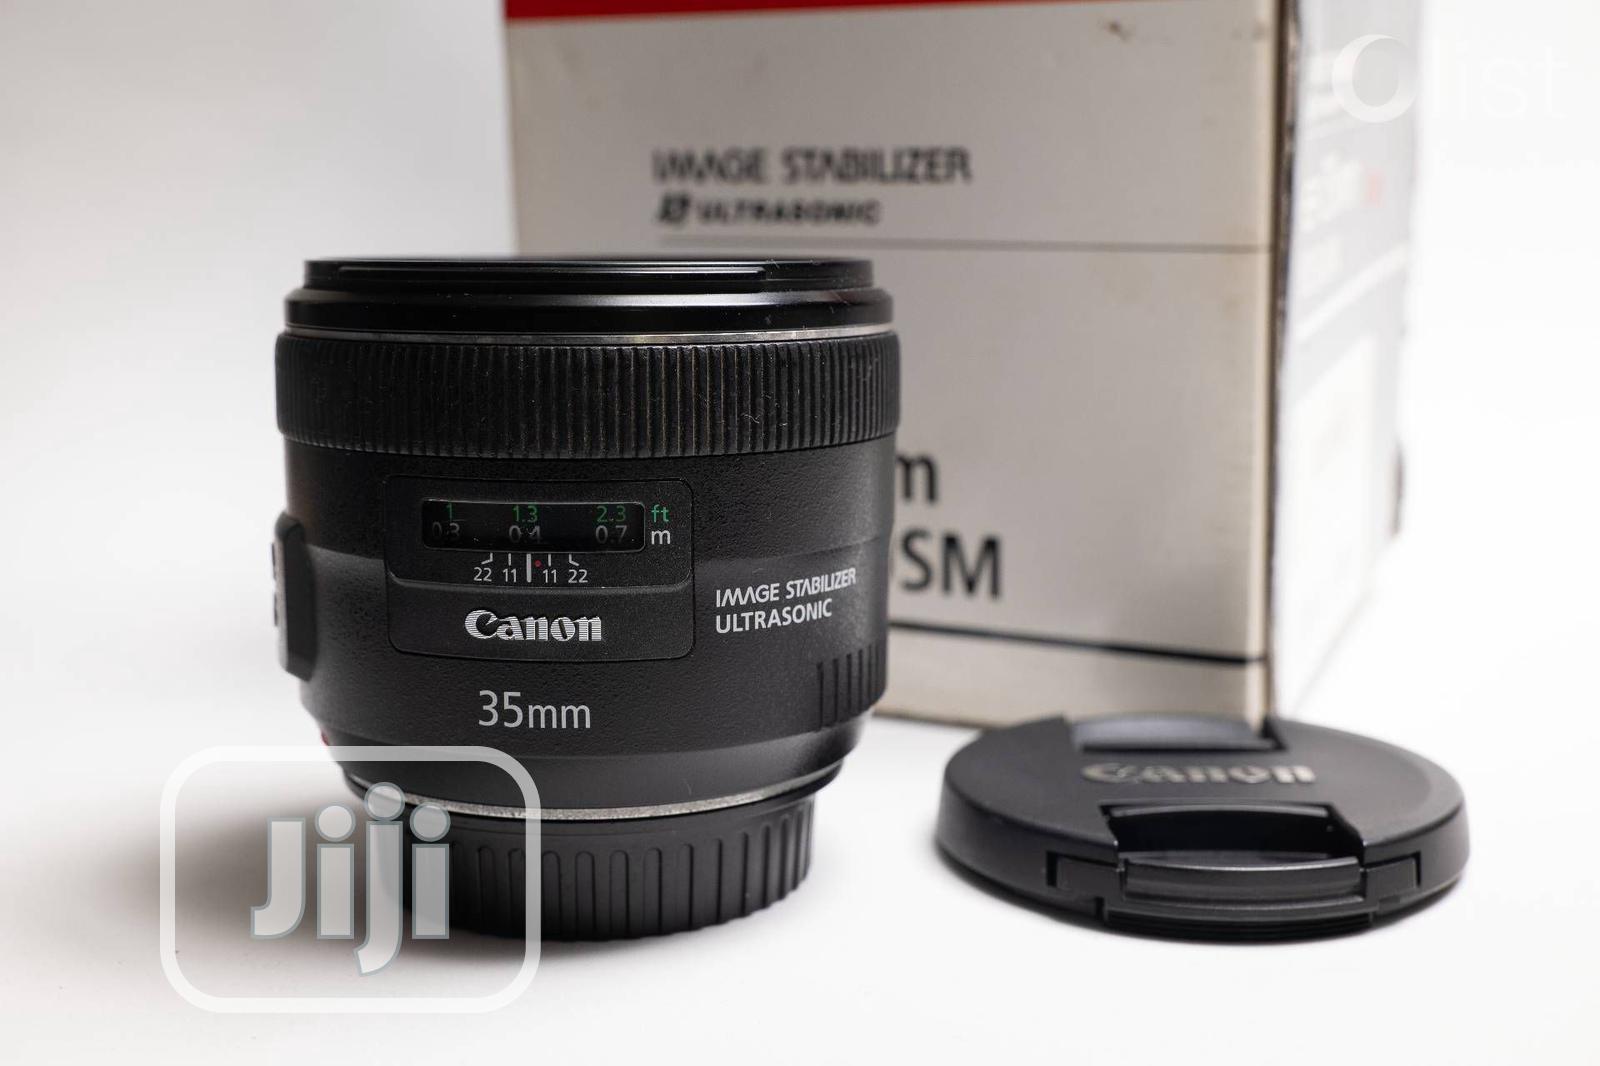 Canon EF 35mm F2 IS USM Used Full Frame Lens For SALE